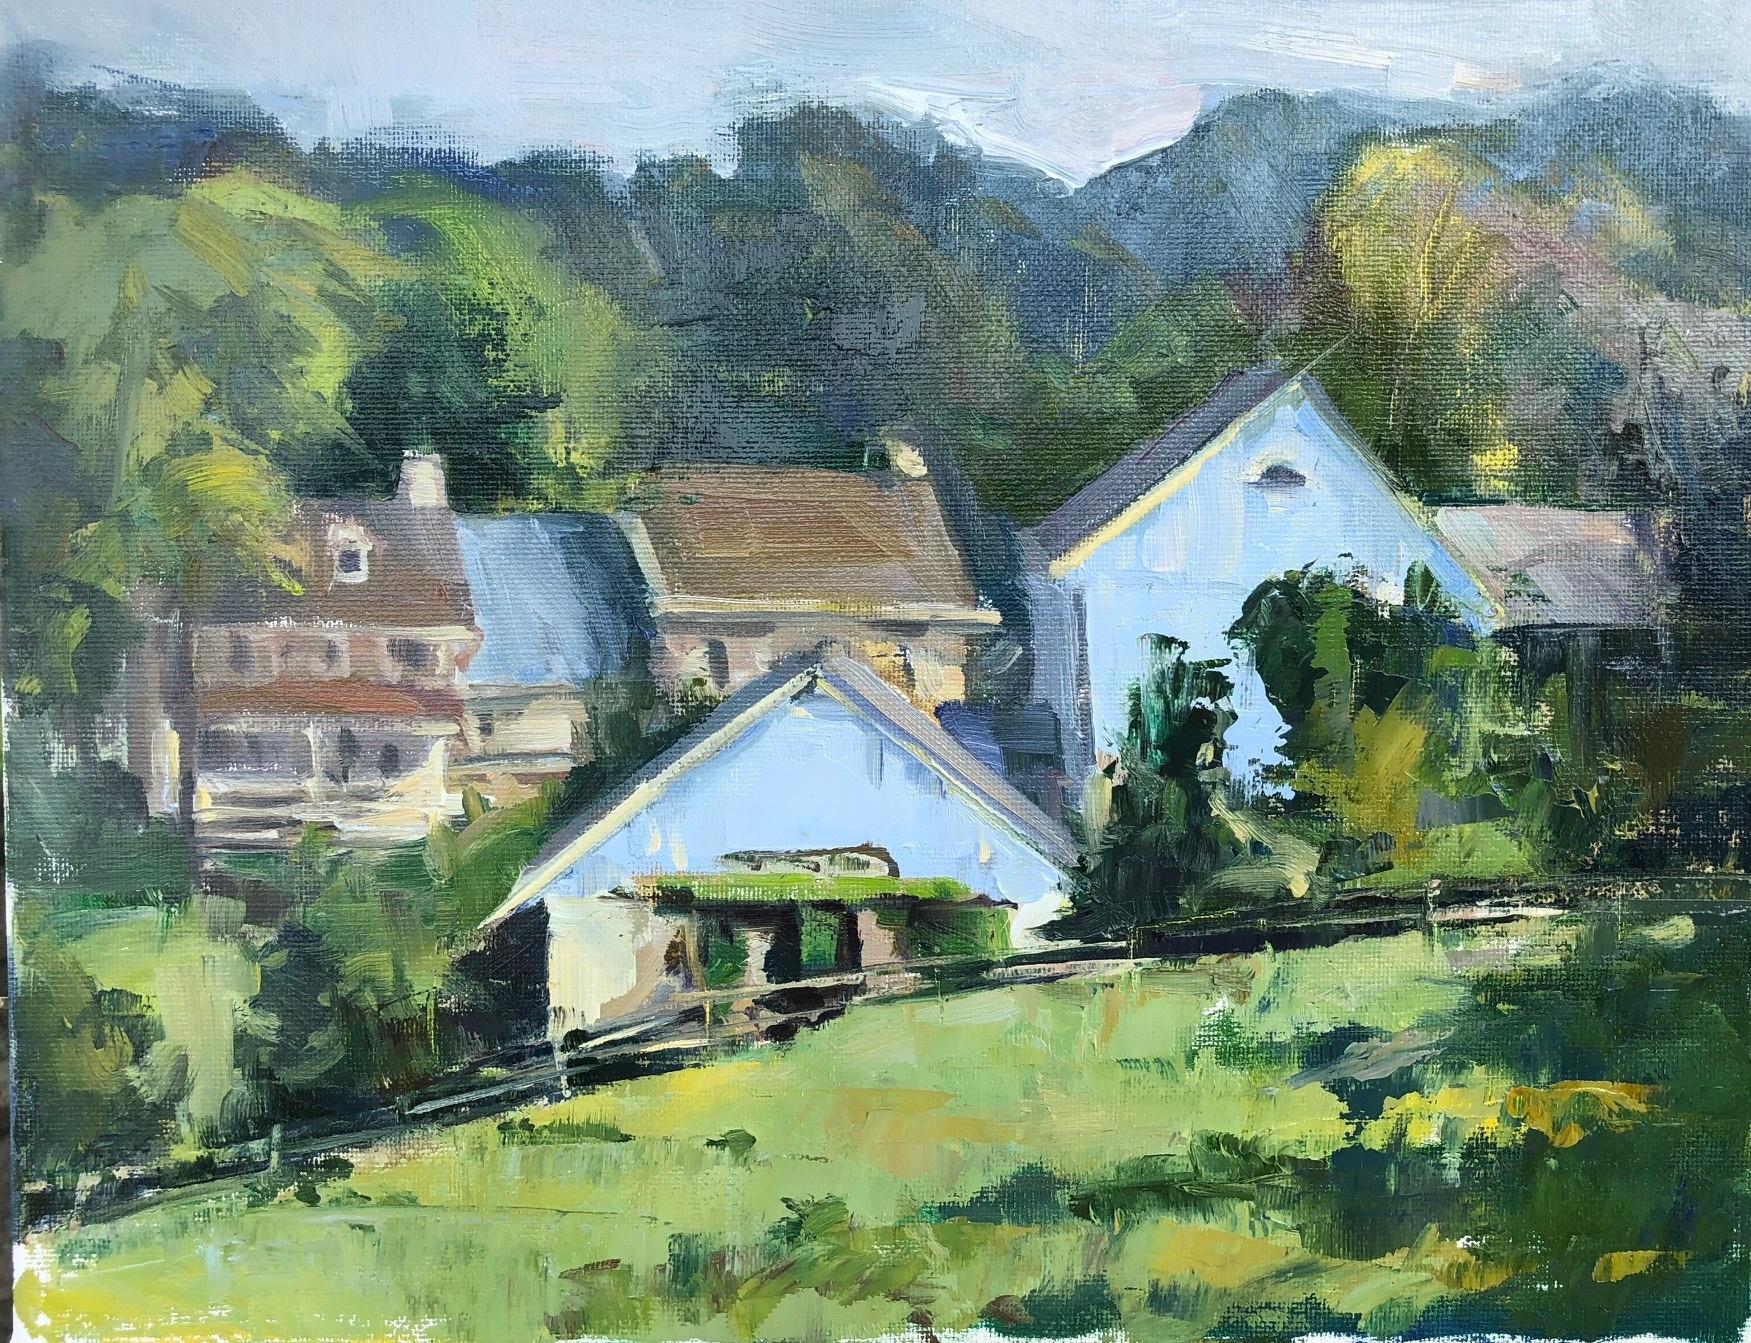 Rose Hill Farm by Jacalyn Beam